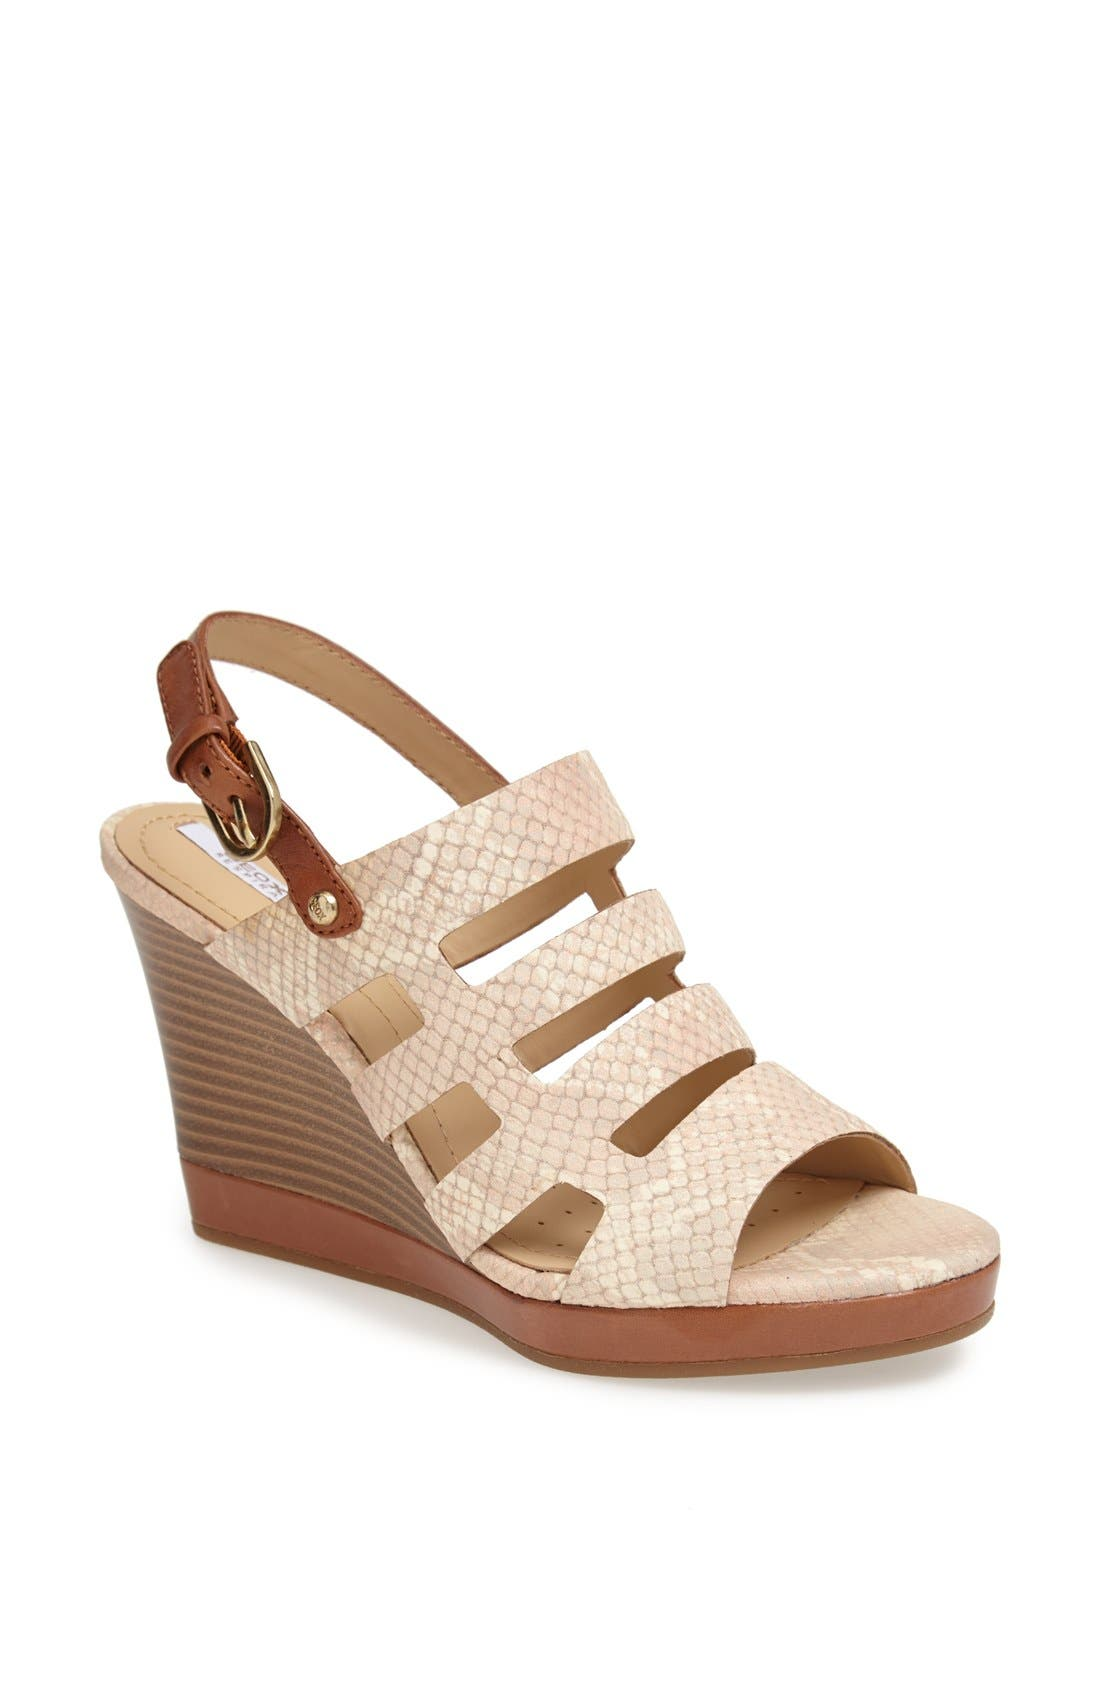 Alternate Image 1 Selected - Geox 'Sibilla' Wedge Sandal